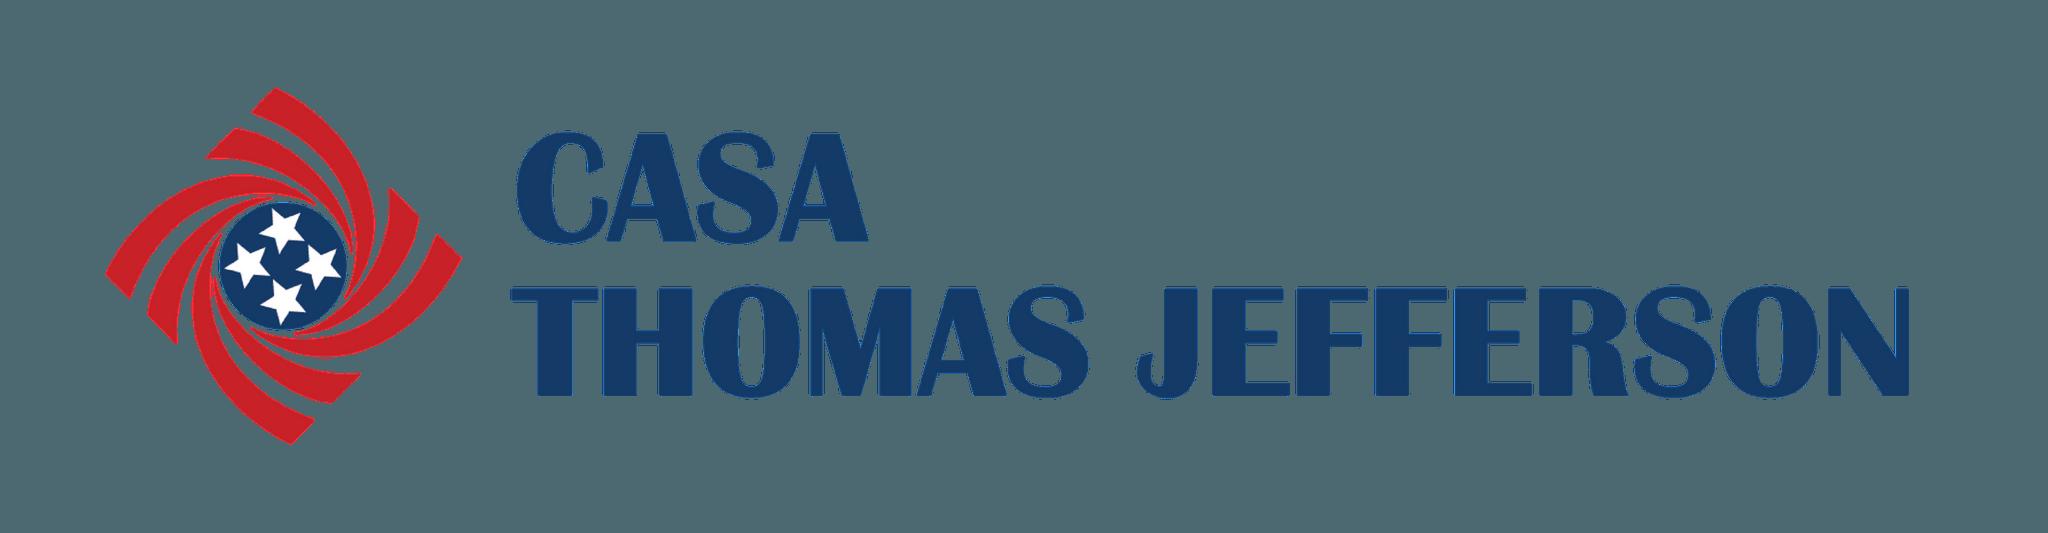 Thomas Jefferson-brasilia-encontro-regional